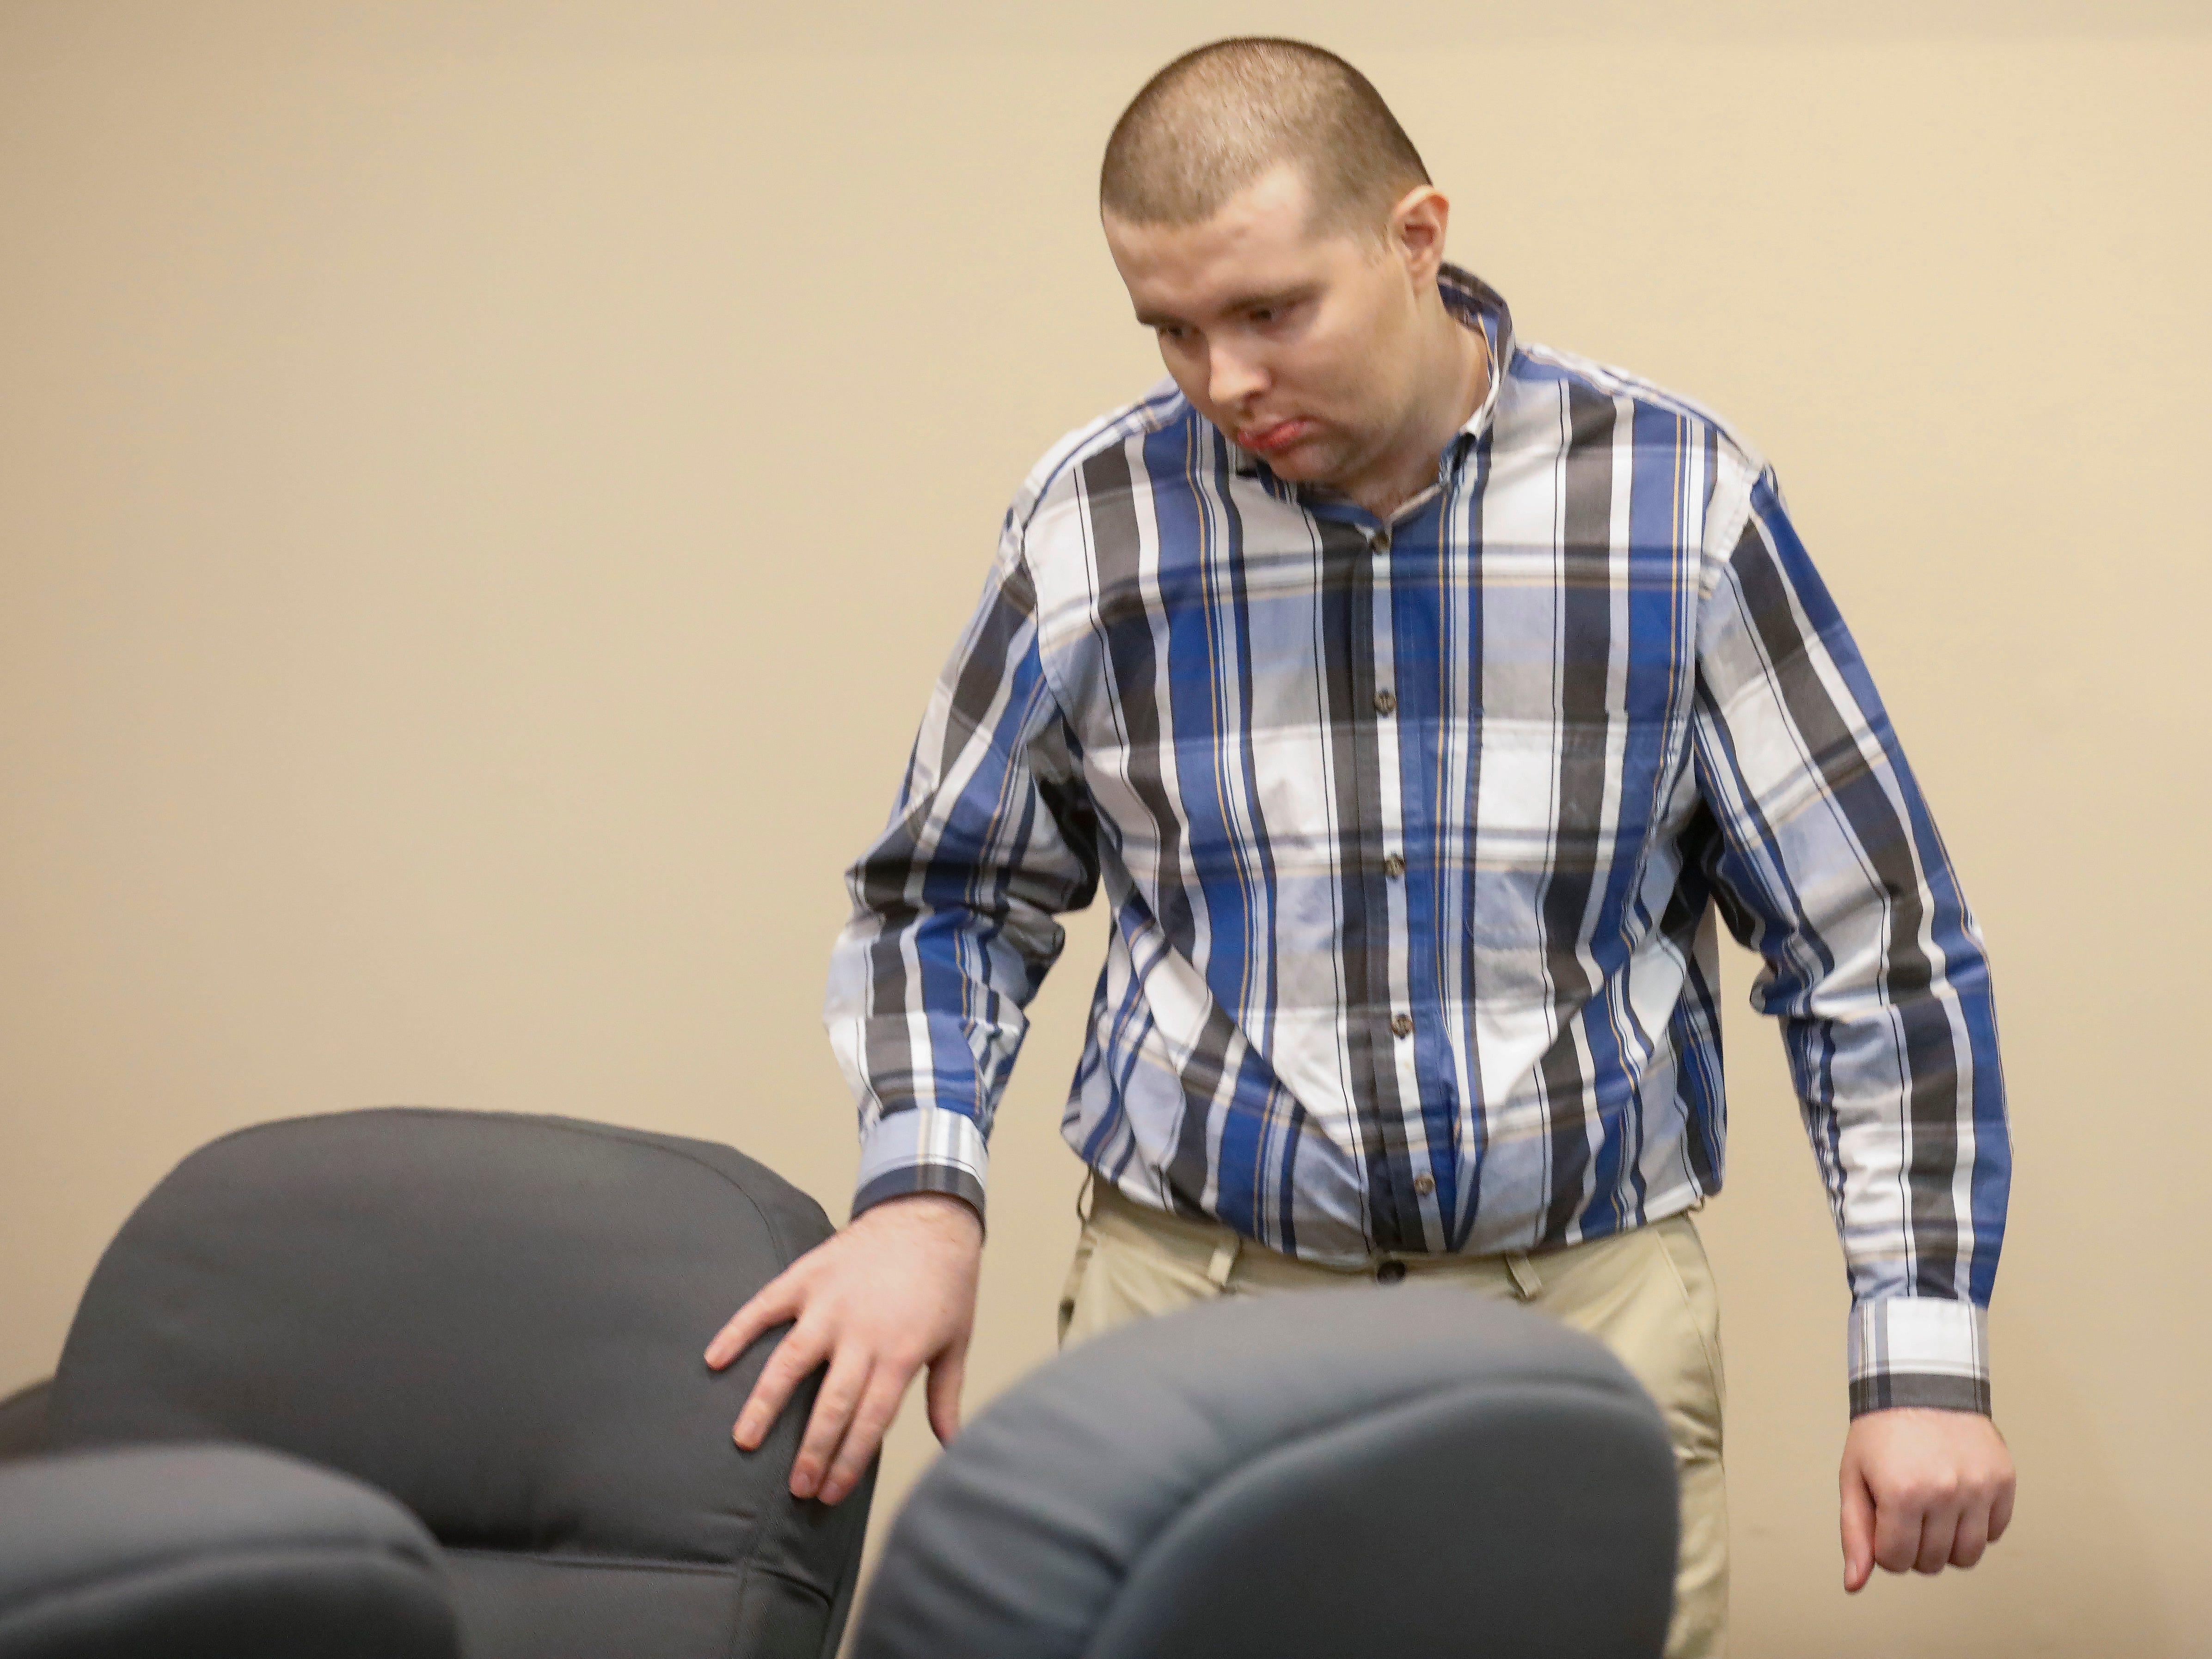 Nicholas Godejohn found guilty in Blanchard murder